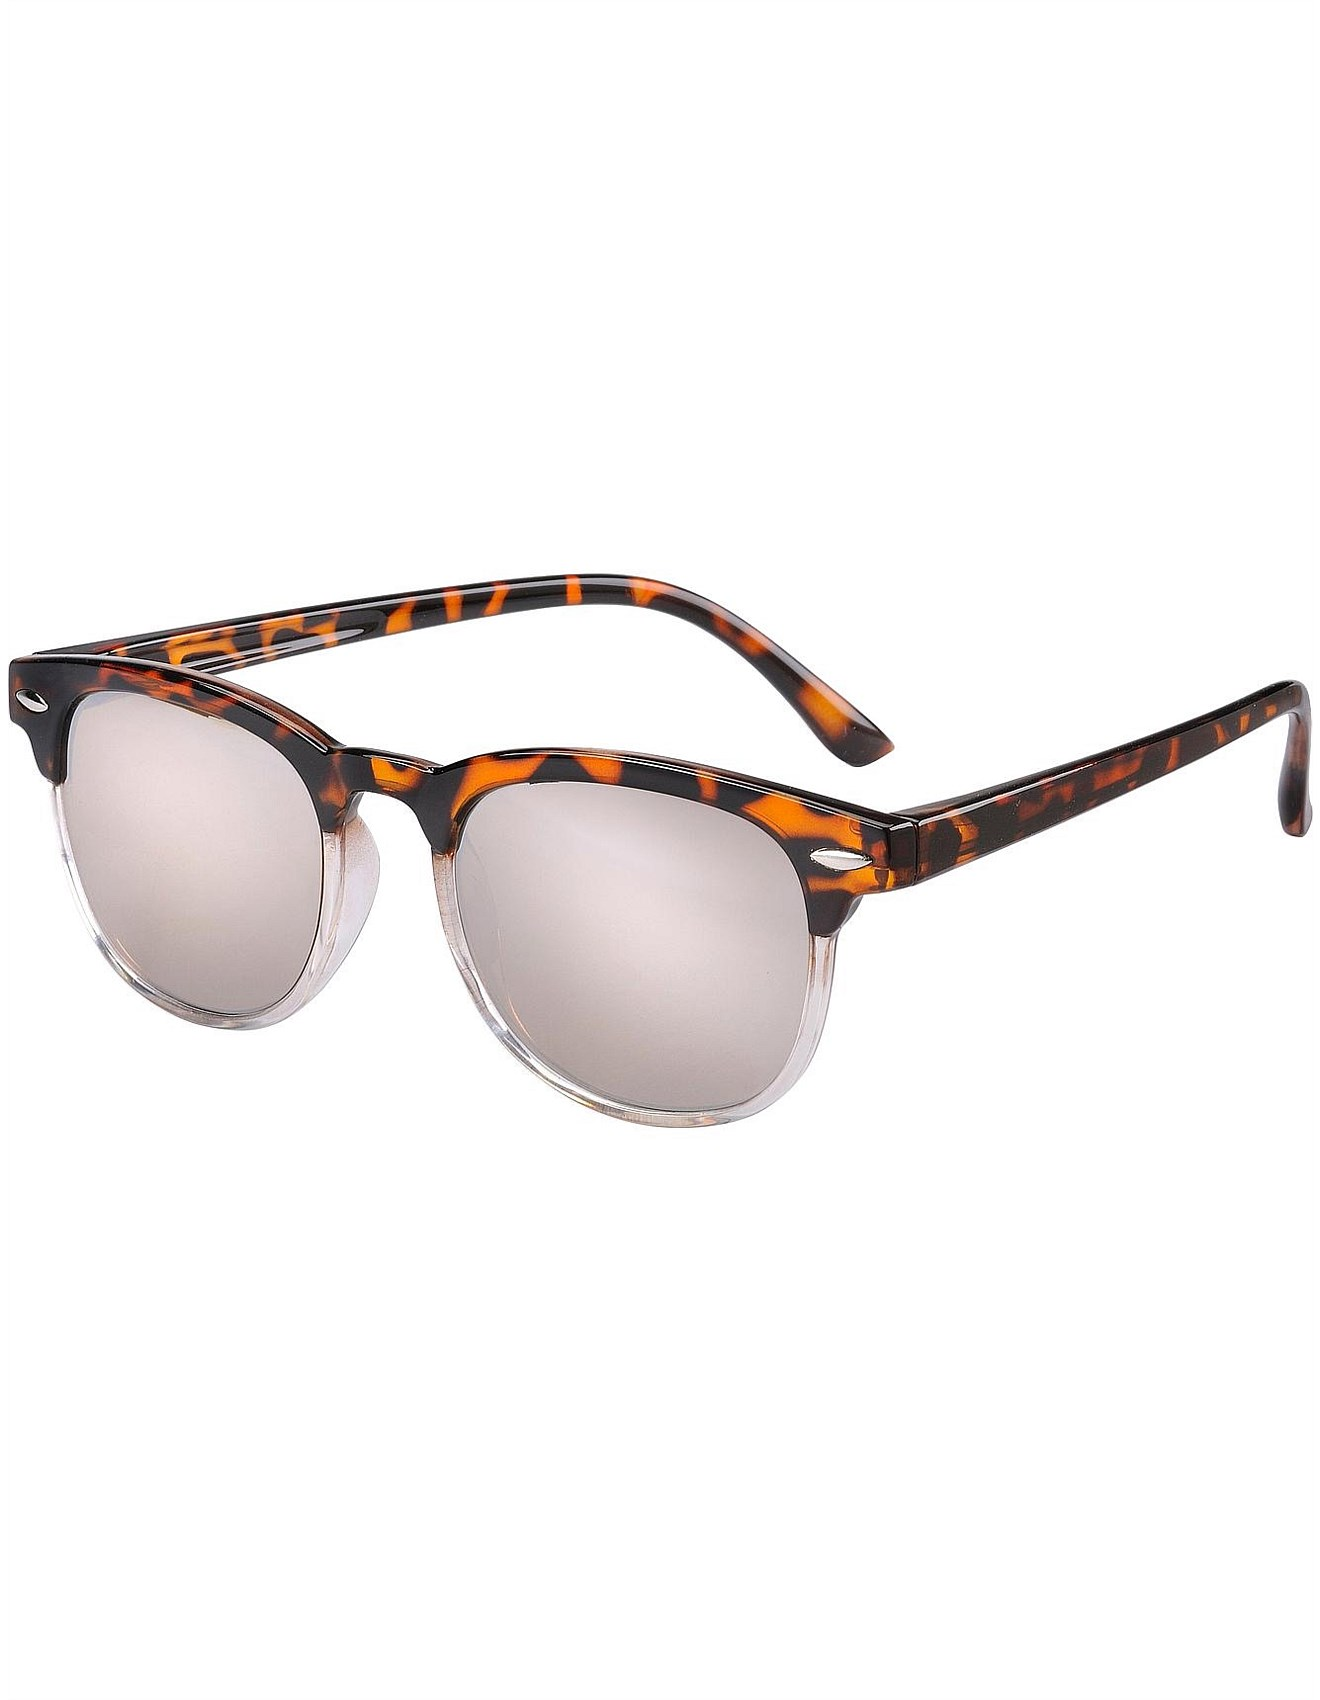 71247719b42 Kid Cooper Tort Sunglasses